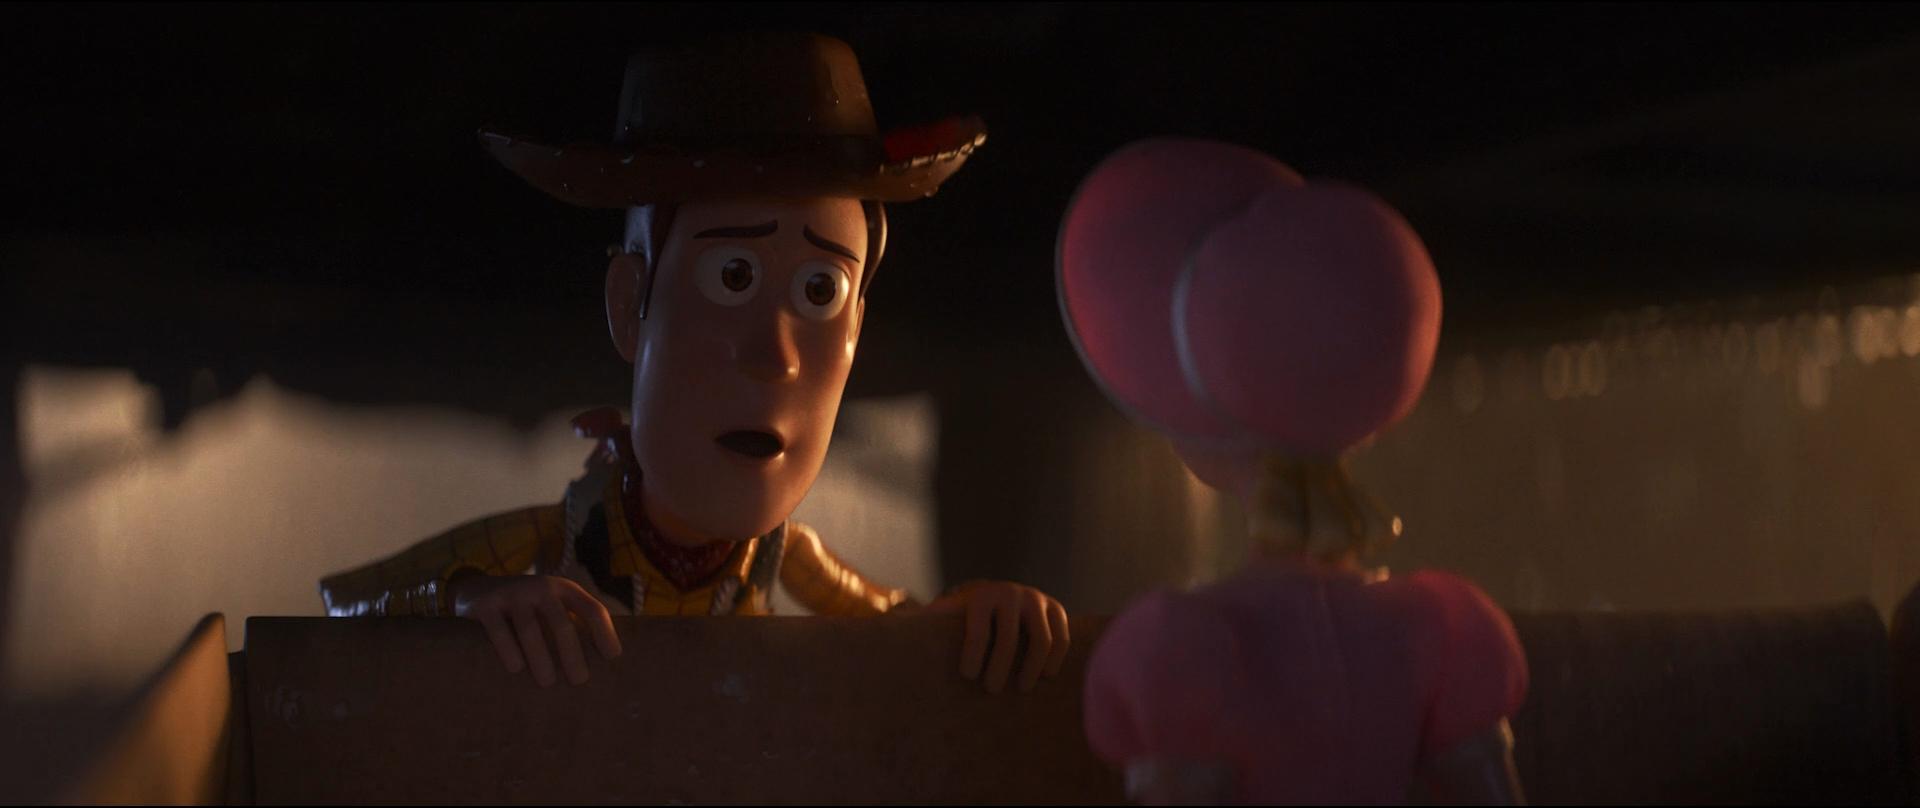 Toy Story Movies Collection 1995-2019 1080p BluRay x264 - LameyHost المجموعة الكاملة مدبلجة للغة العربية تحميل تورنت 9 arabp2p.com